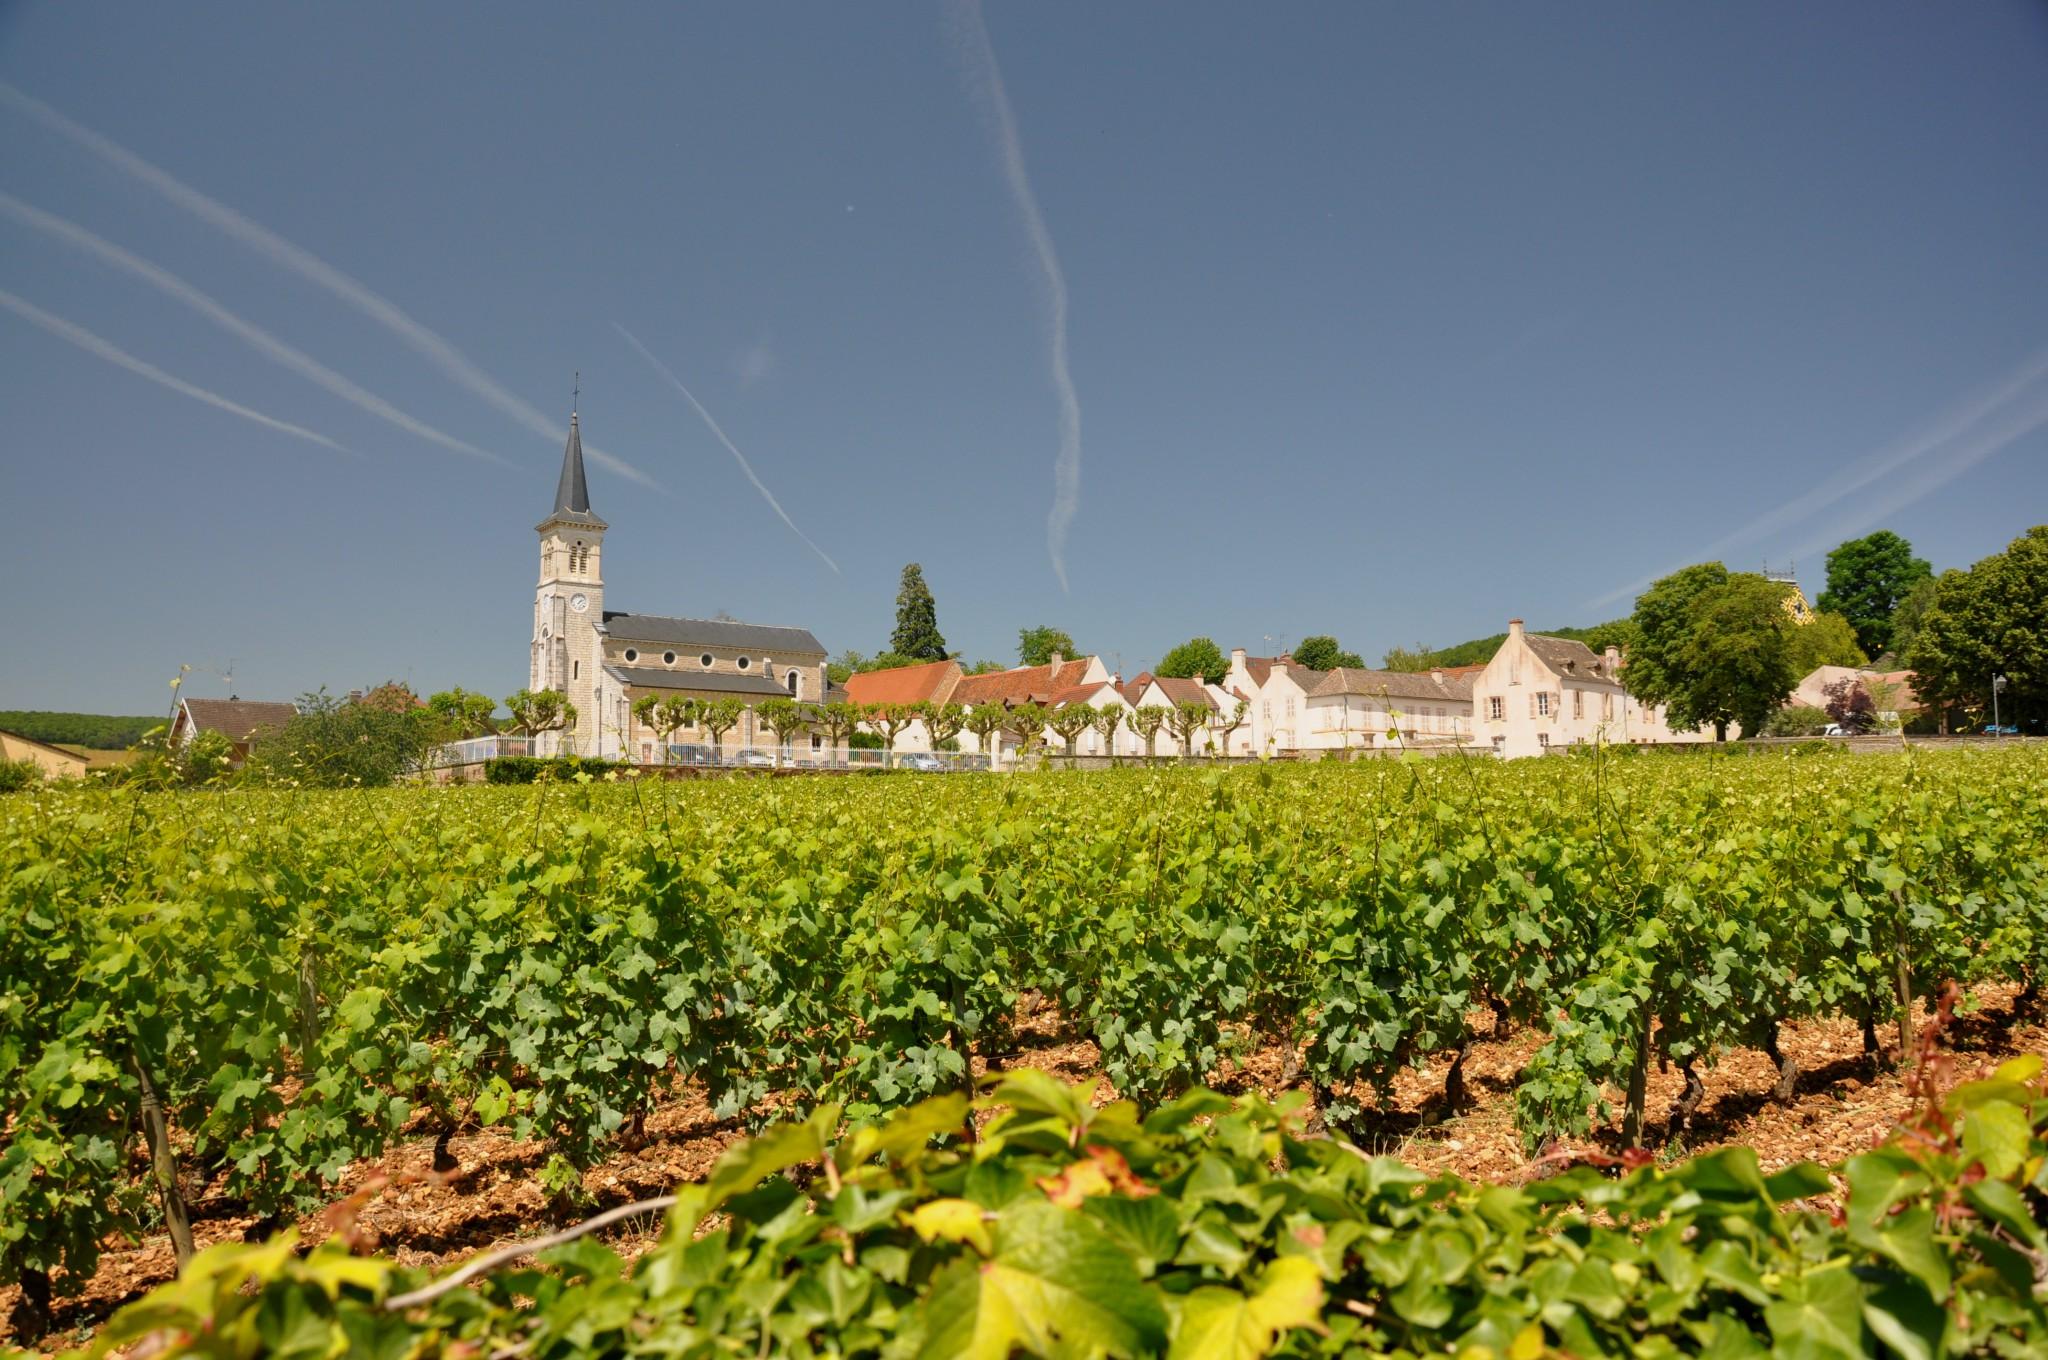 Wine lovers' tips: Vineyards of Aloxe Corton © Palauenc05- licence [CC BY-SA 3